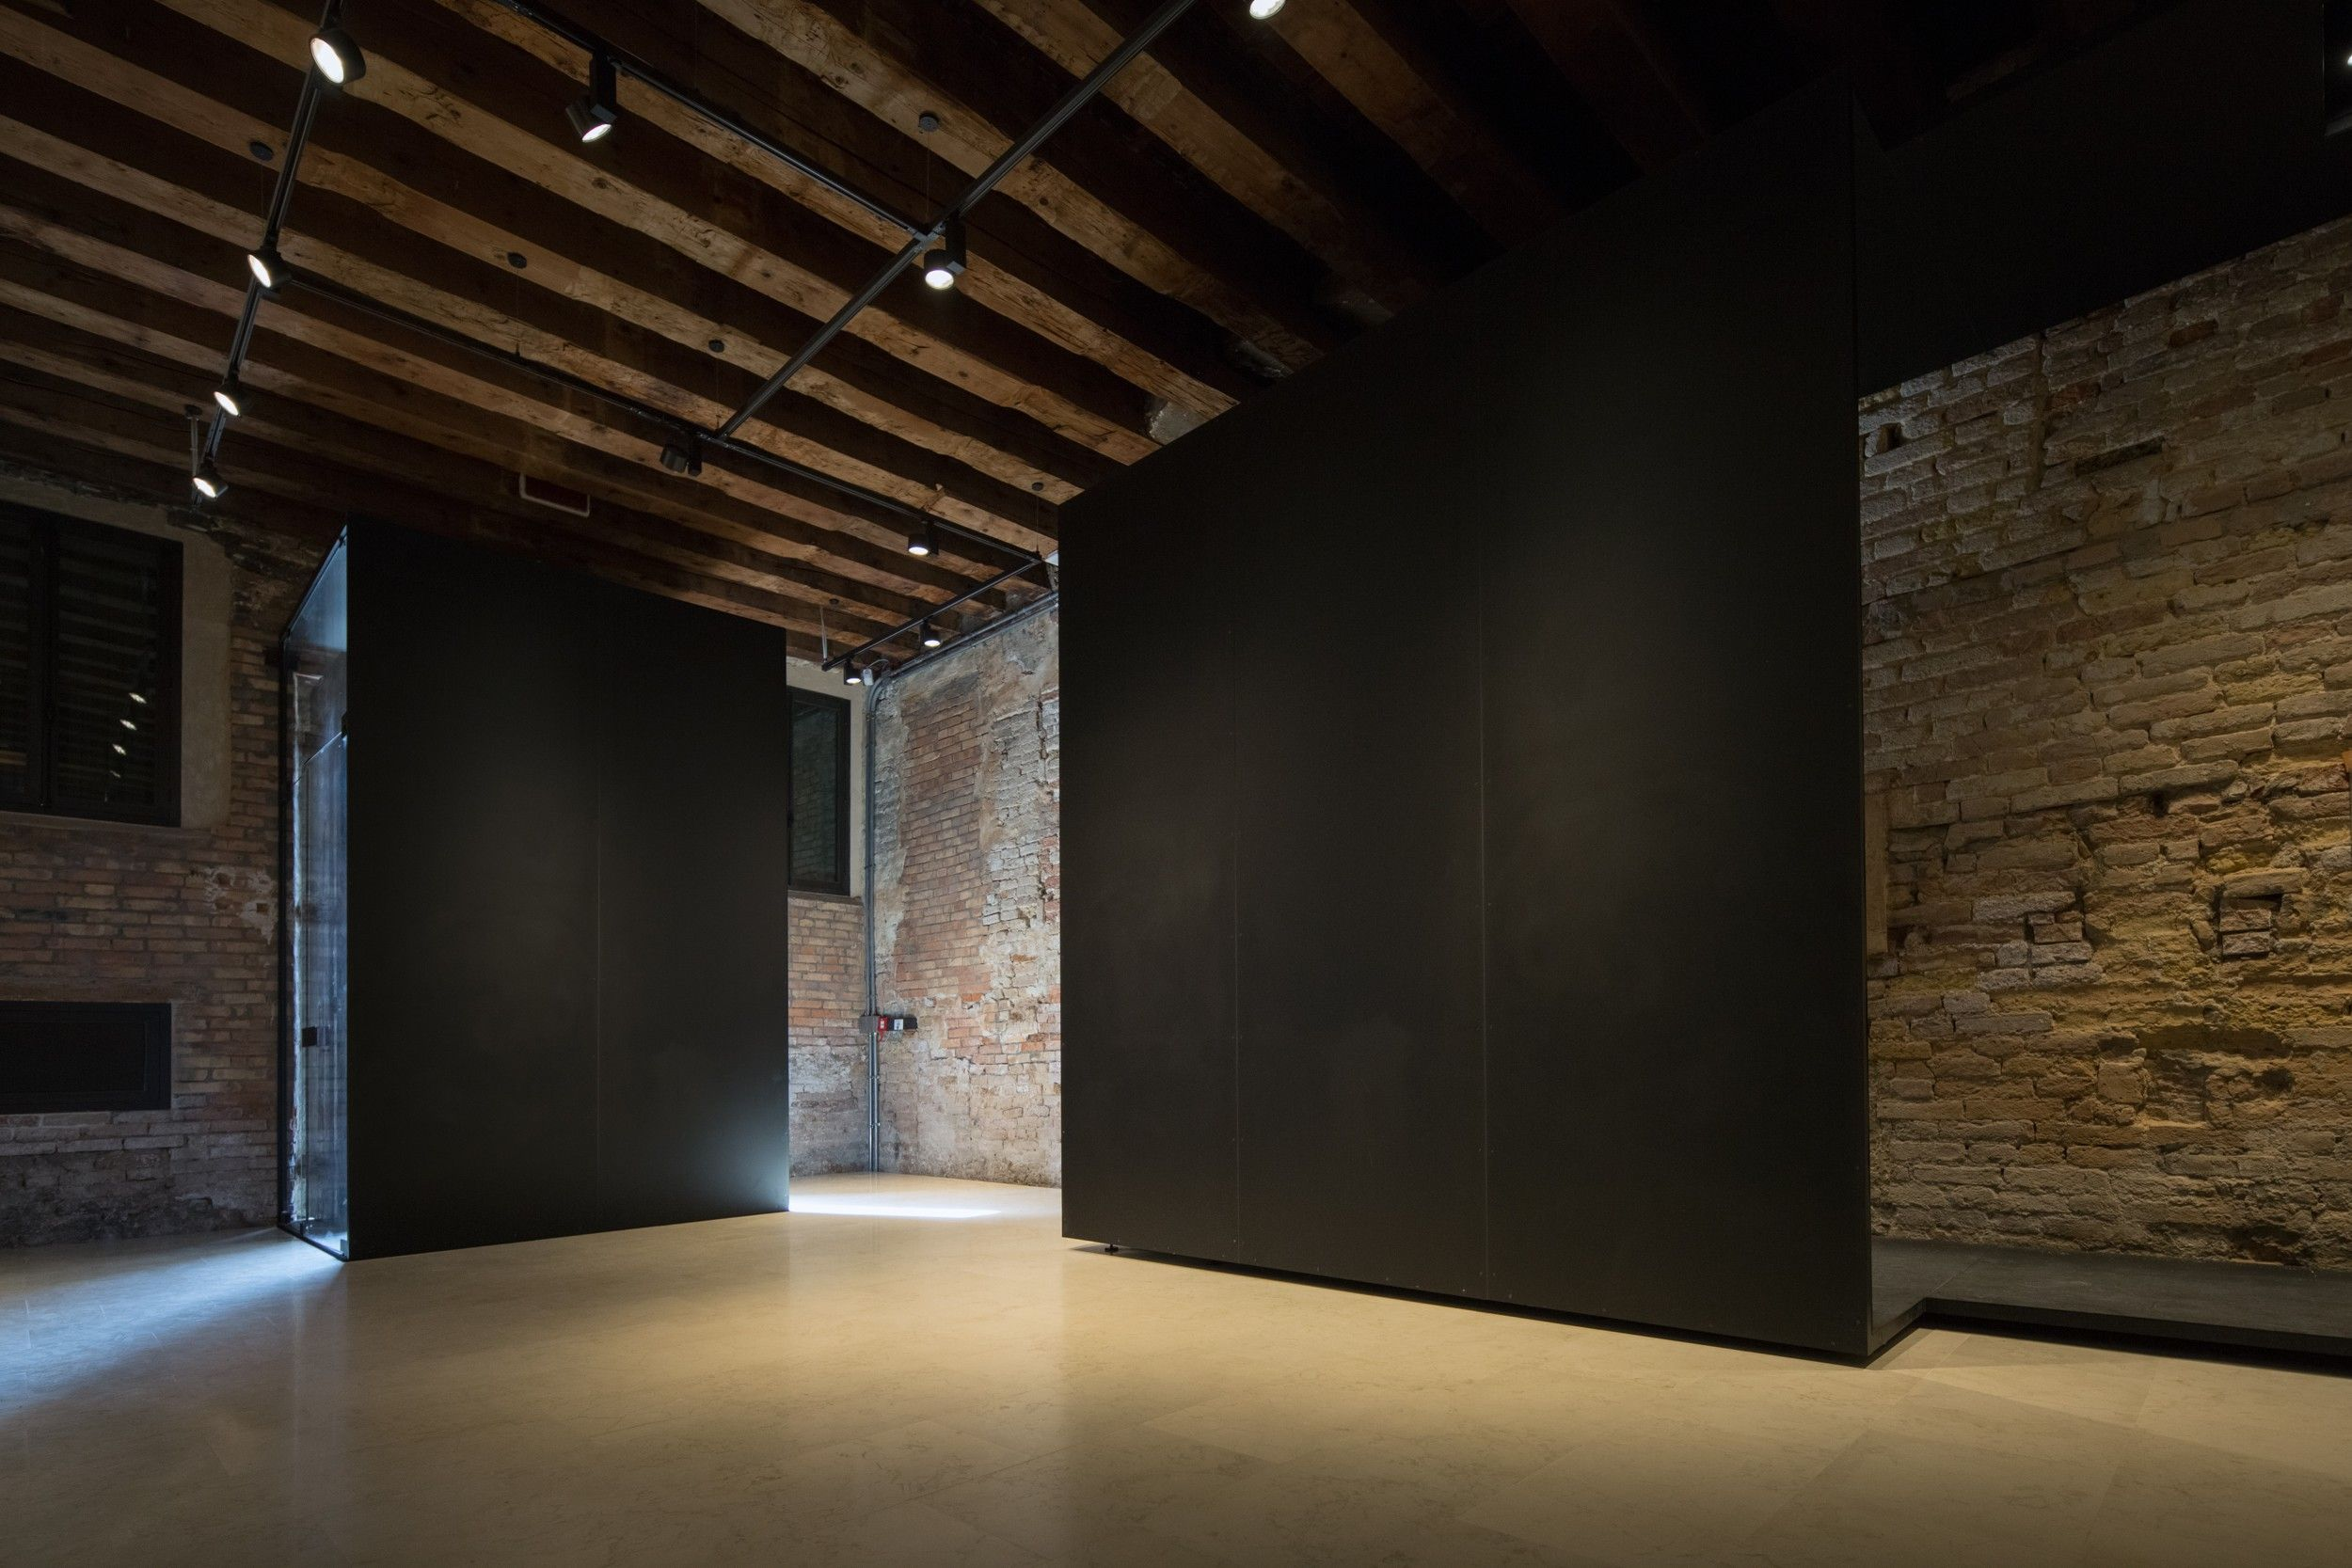 Palazzo Zen In Venice Biennale Interiores Y Muebles Pinterest  # Muebles En New Haven Ct